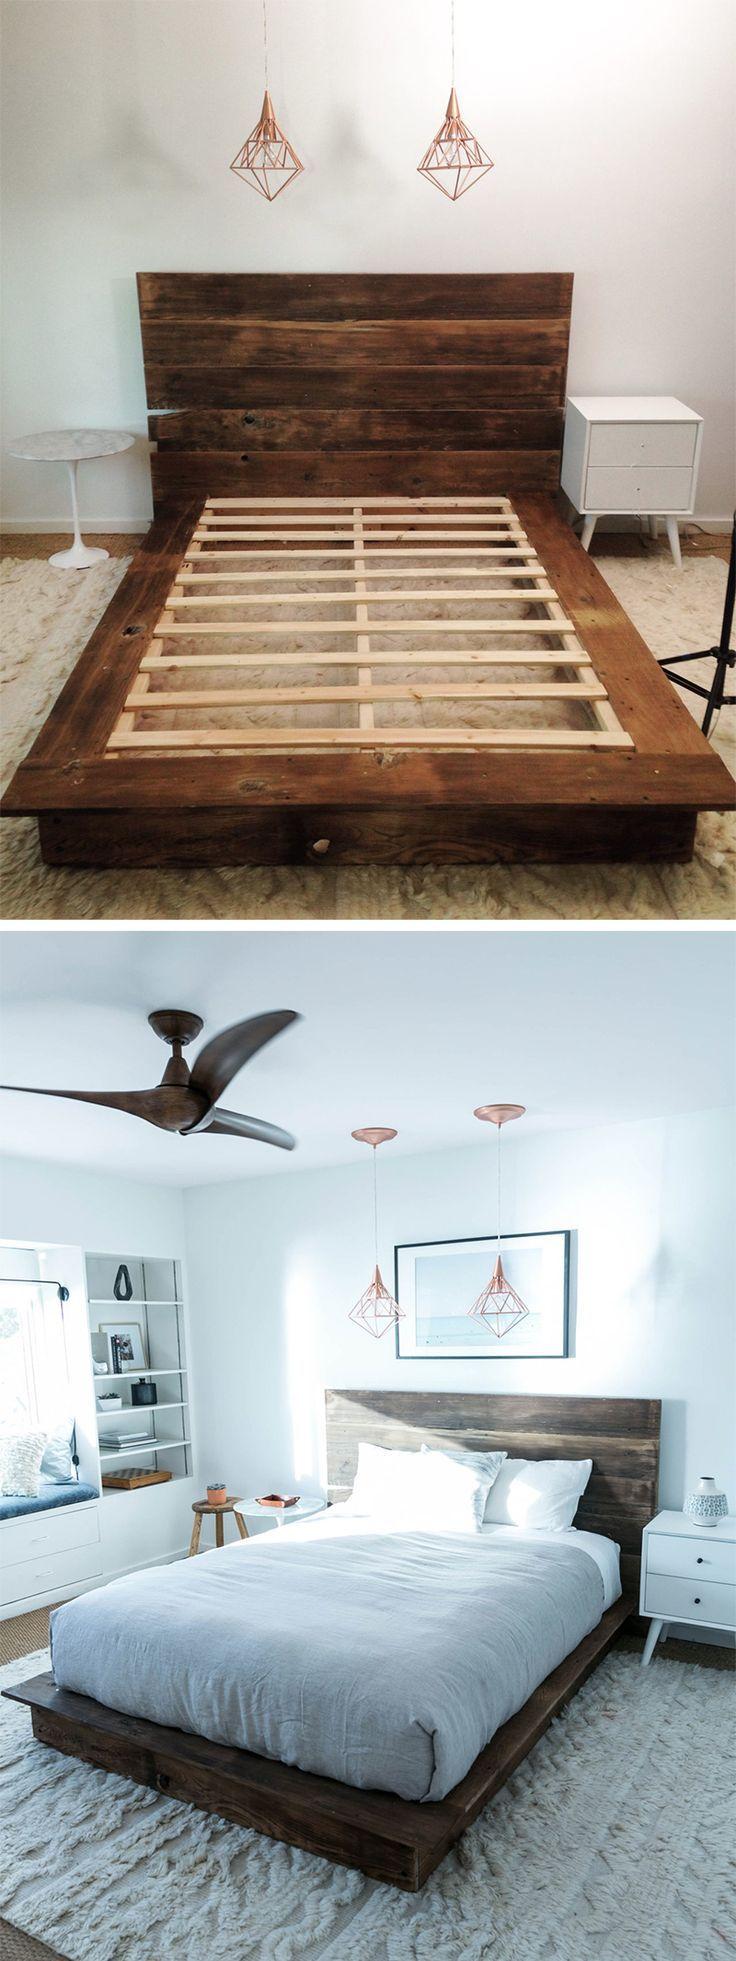 DIY Reclaimed Wood Platform Bed Bedroom Decor in 2019